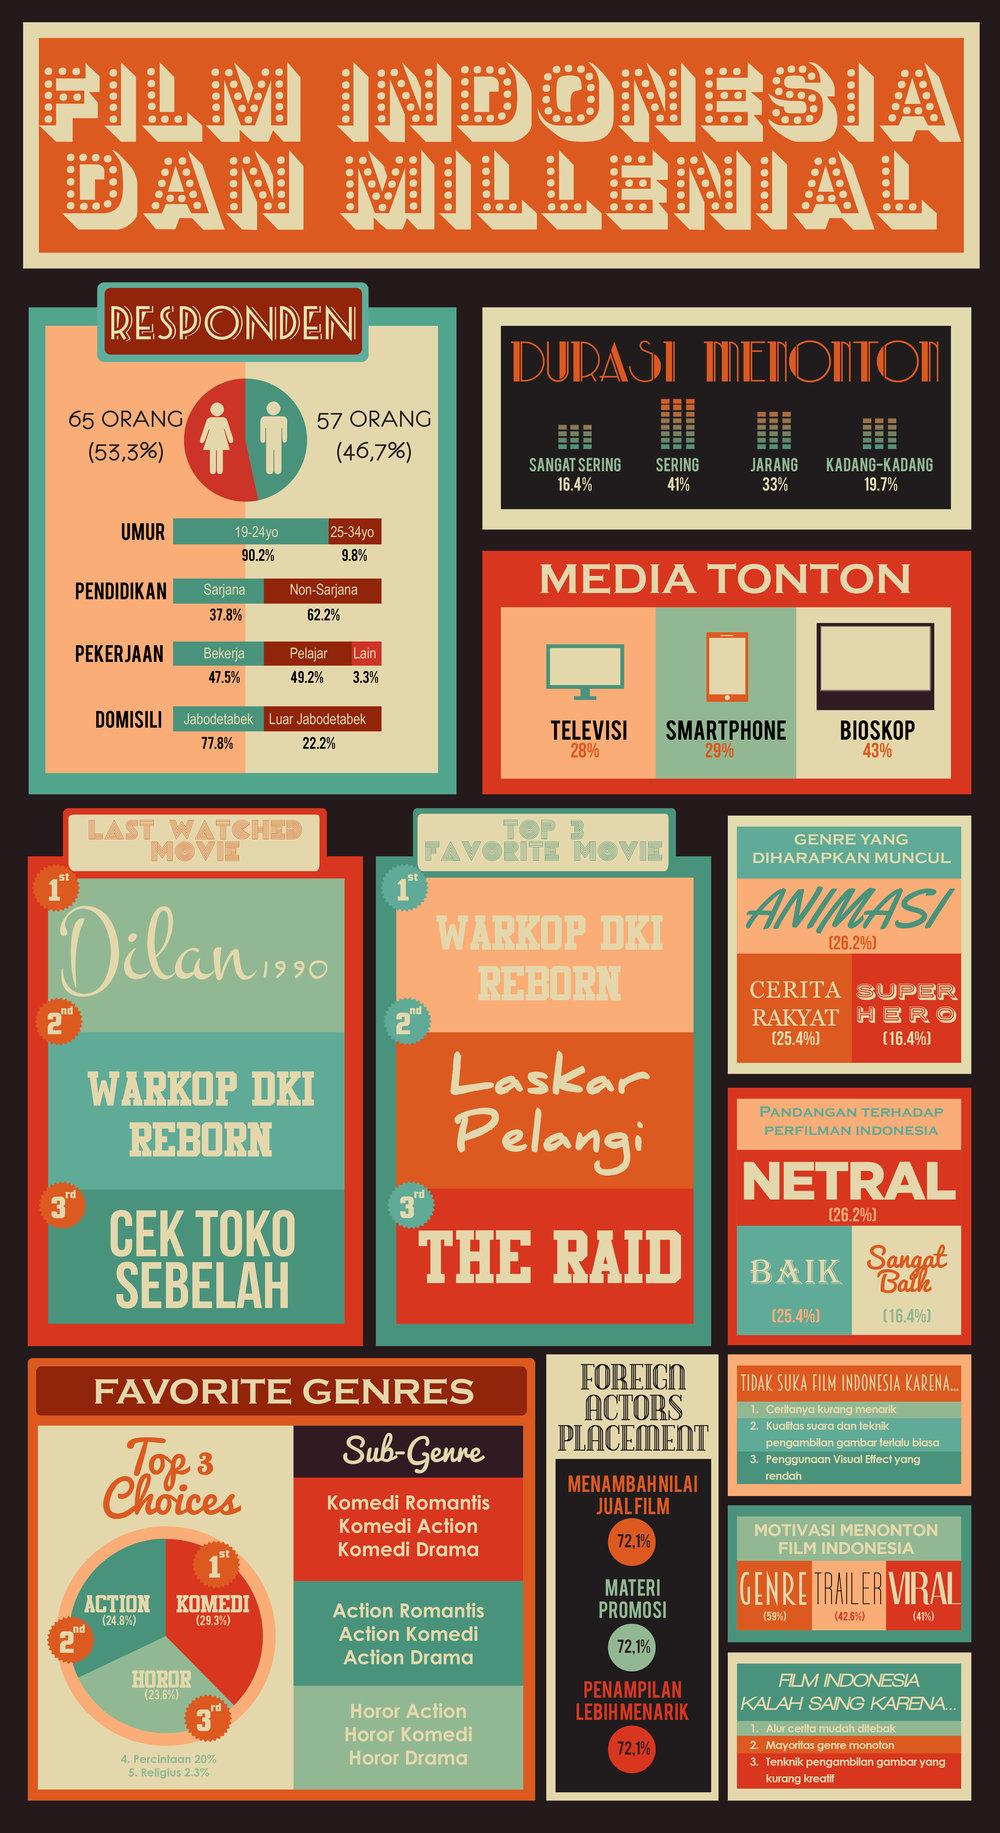 Film Indonesia.jpg